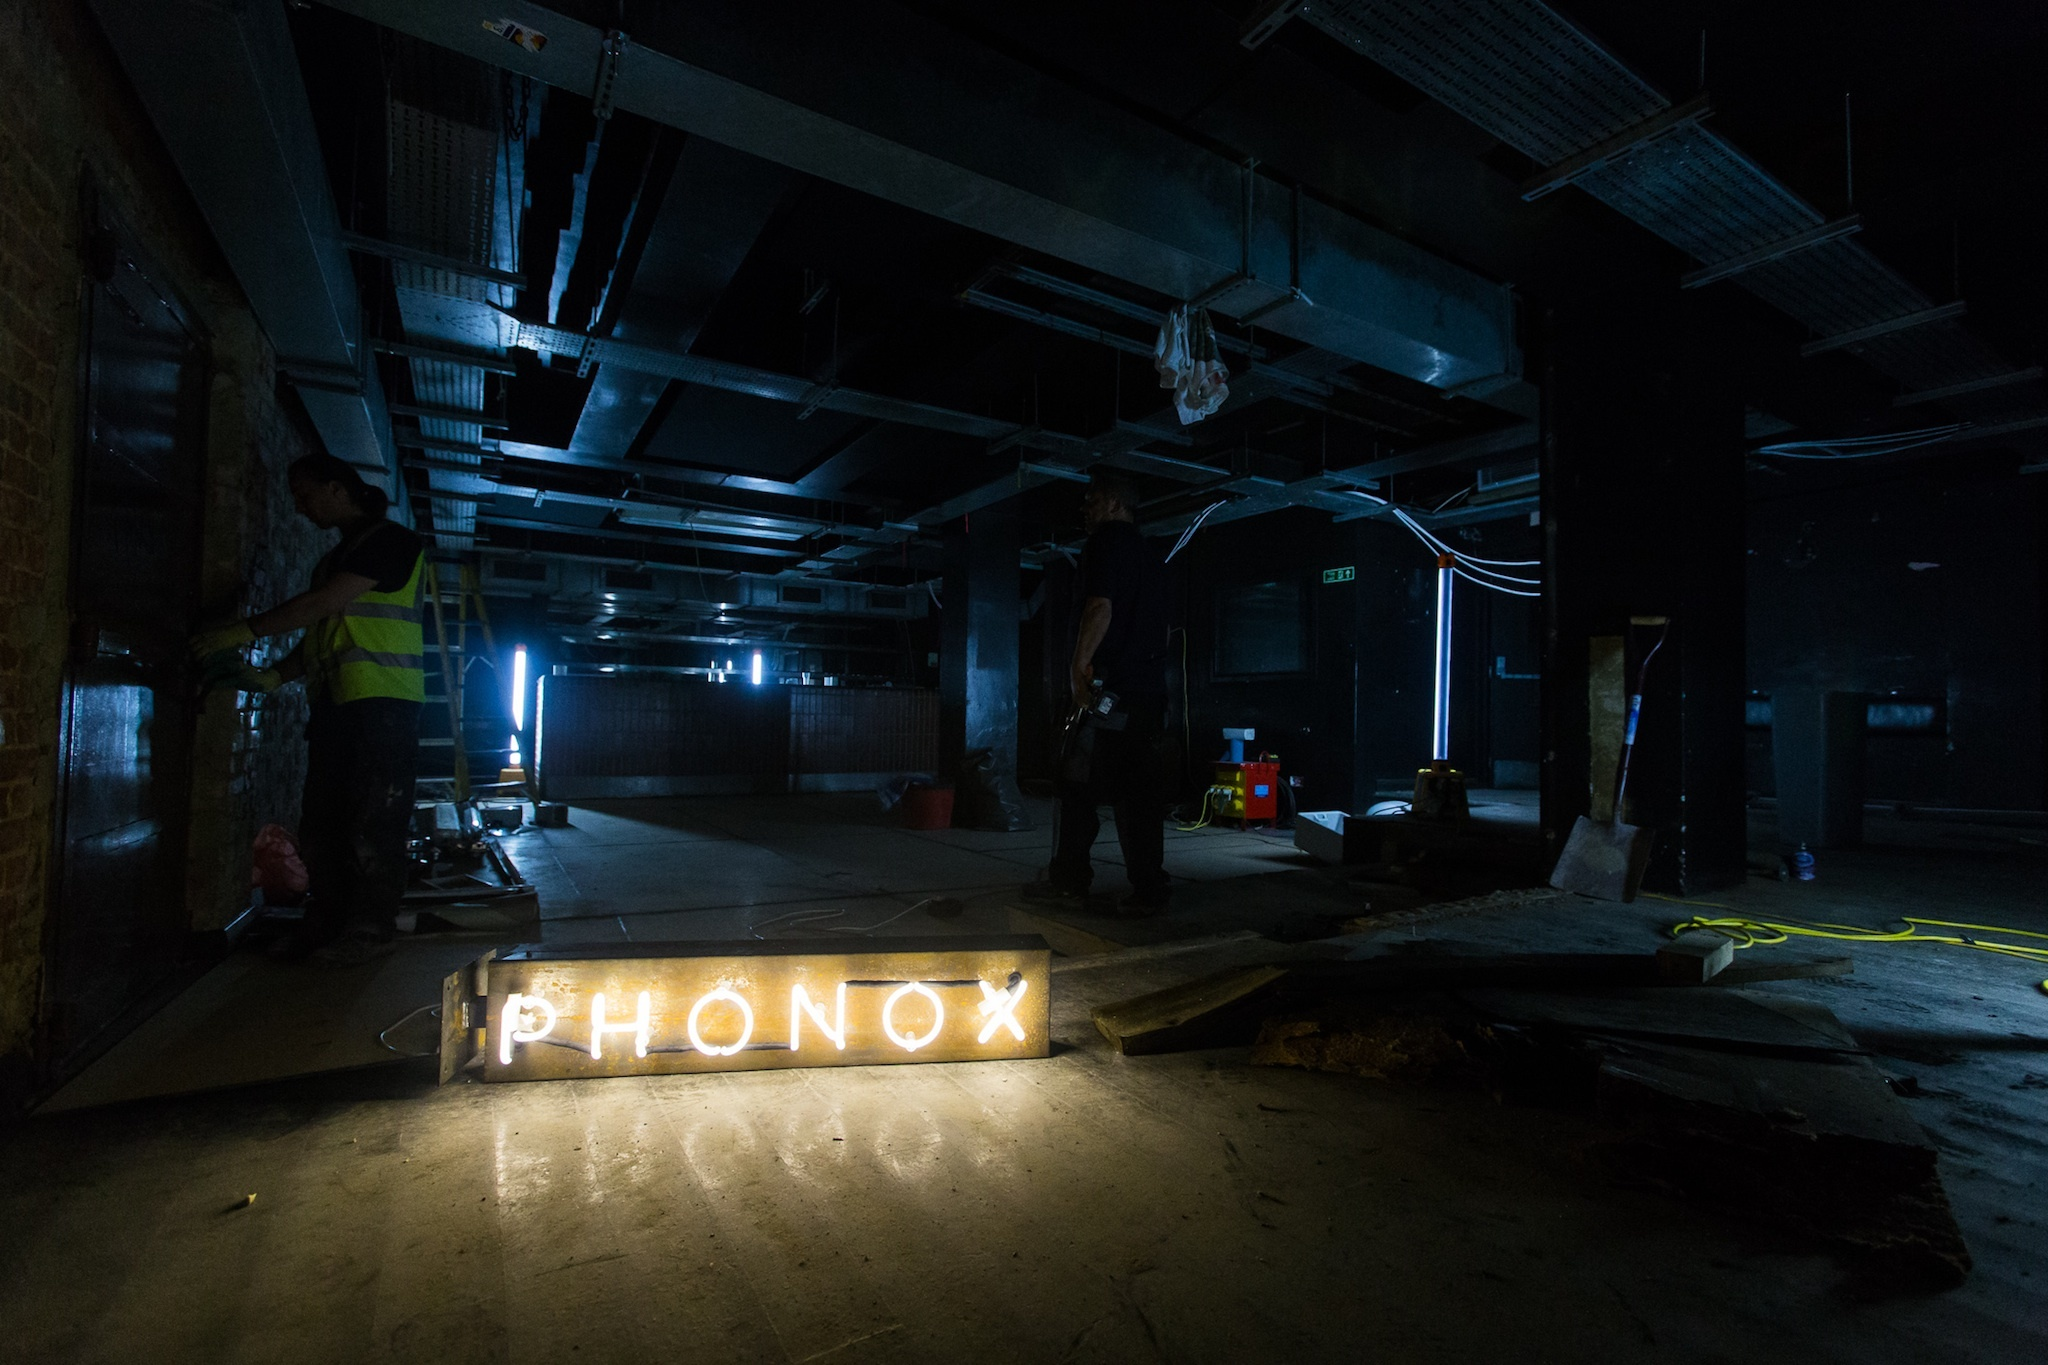 Phonox, Brixton